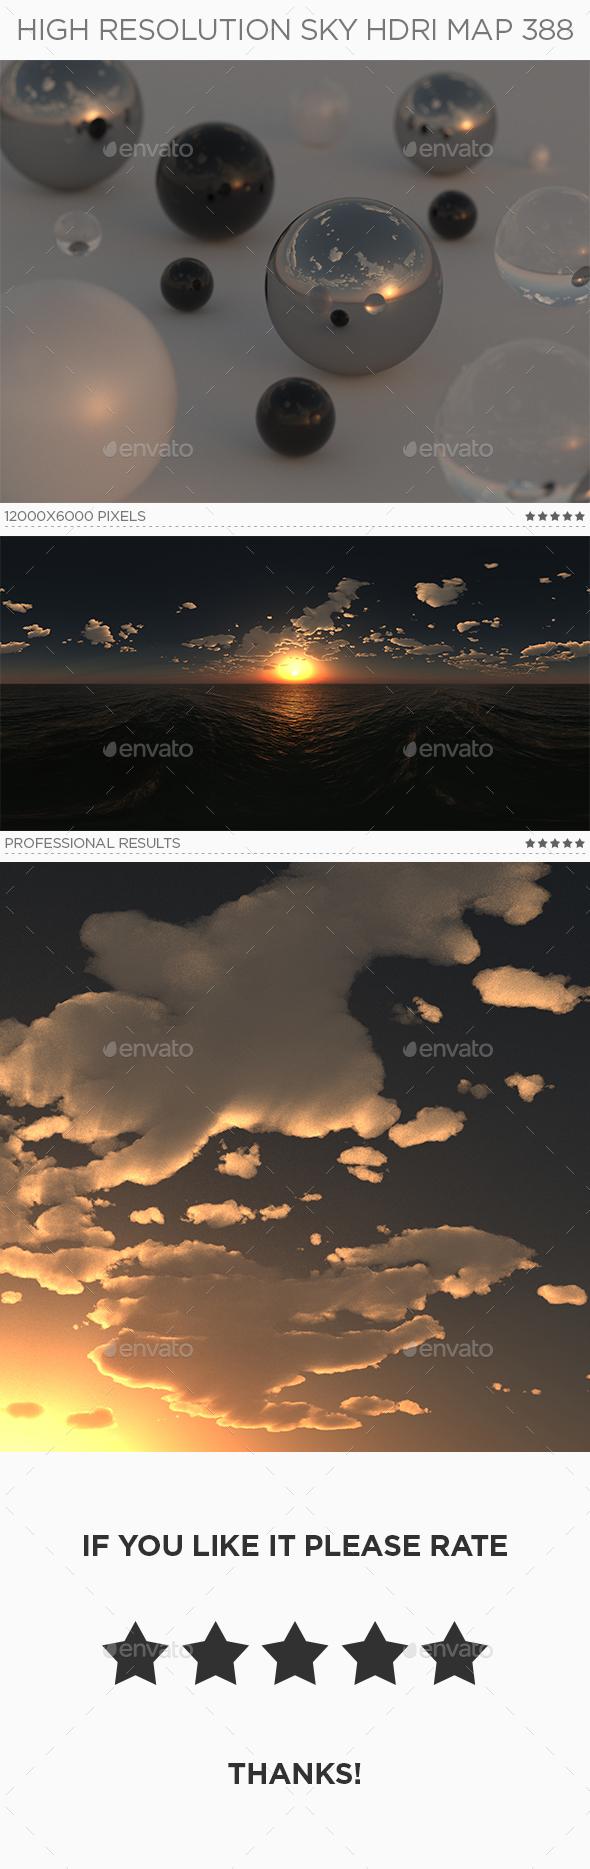 High Resolution Sky HDRi Map 388 - 3DOcean Item for Sale